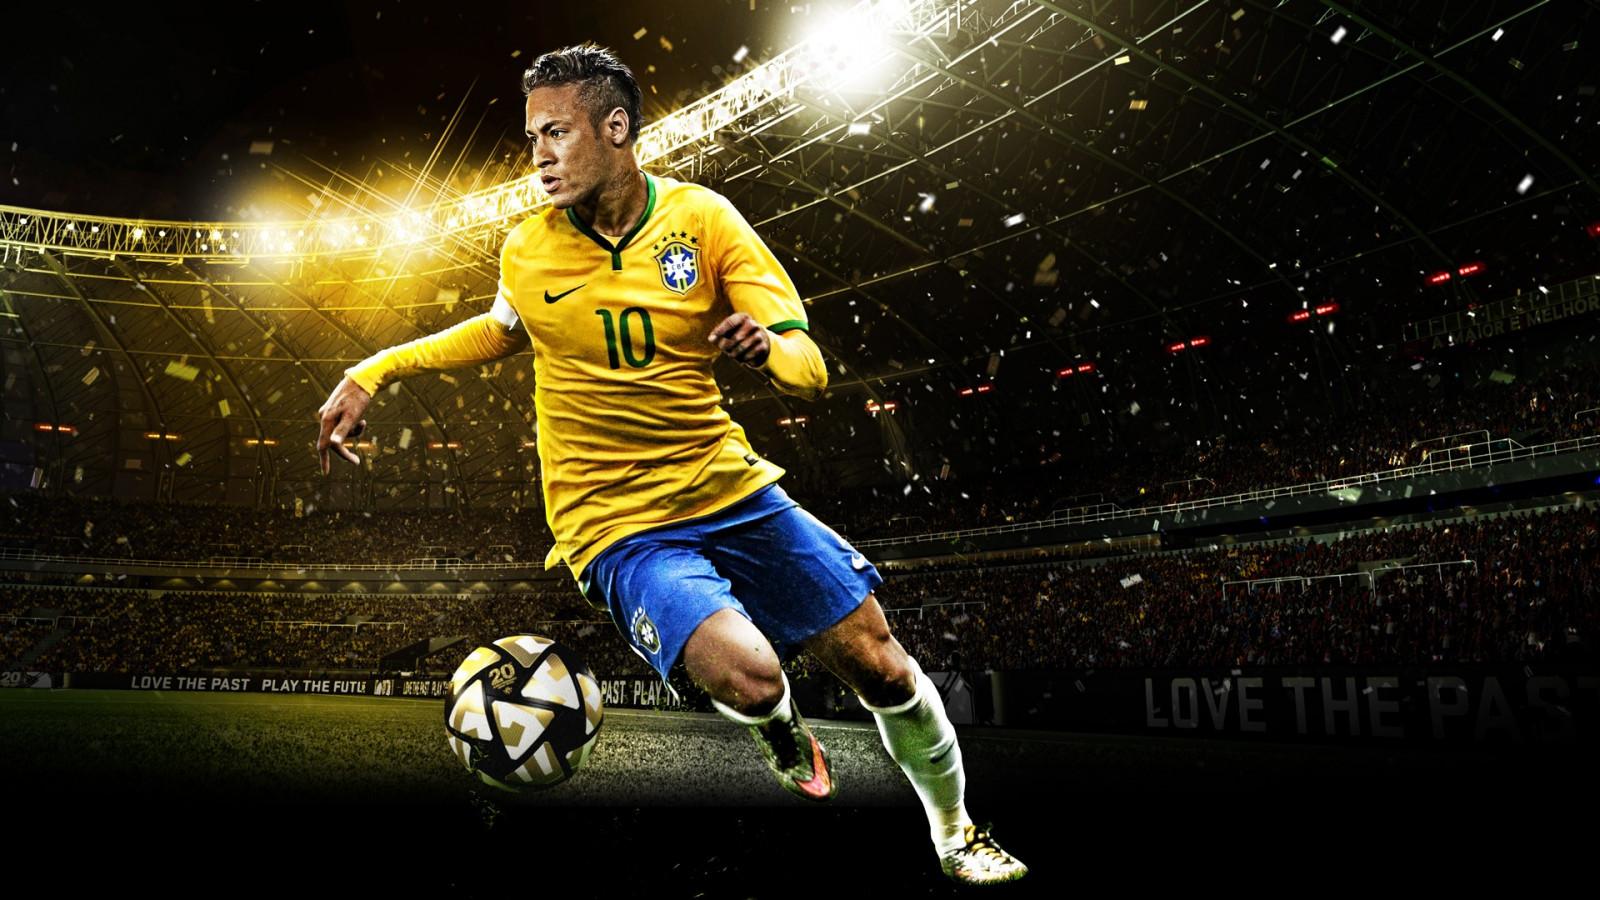 Fondos De Pantalla Fútbol Pelota Silueta Deporte: Fondos De Pantalla : Deportes, Portero, Neymar, Pelota